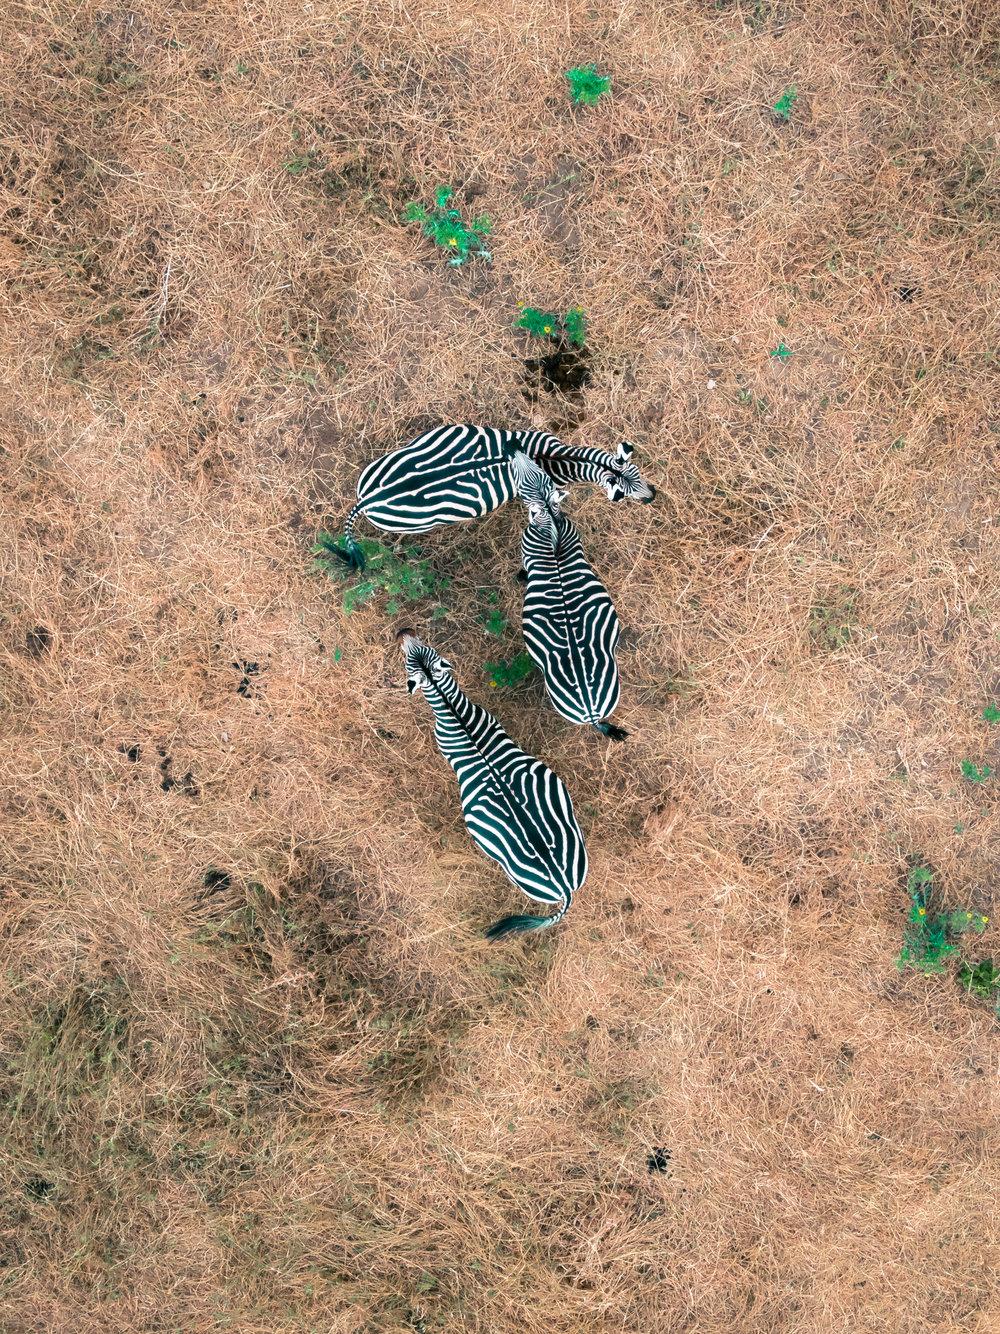 Zebra_typoland_aerial.jpg